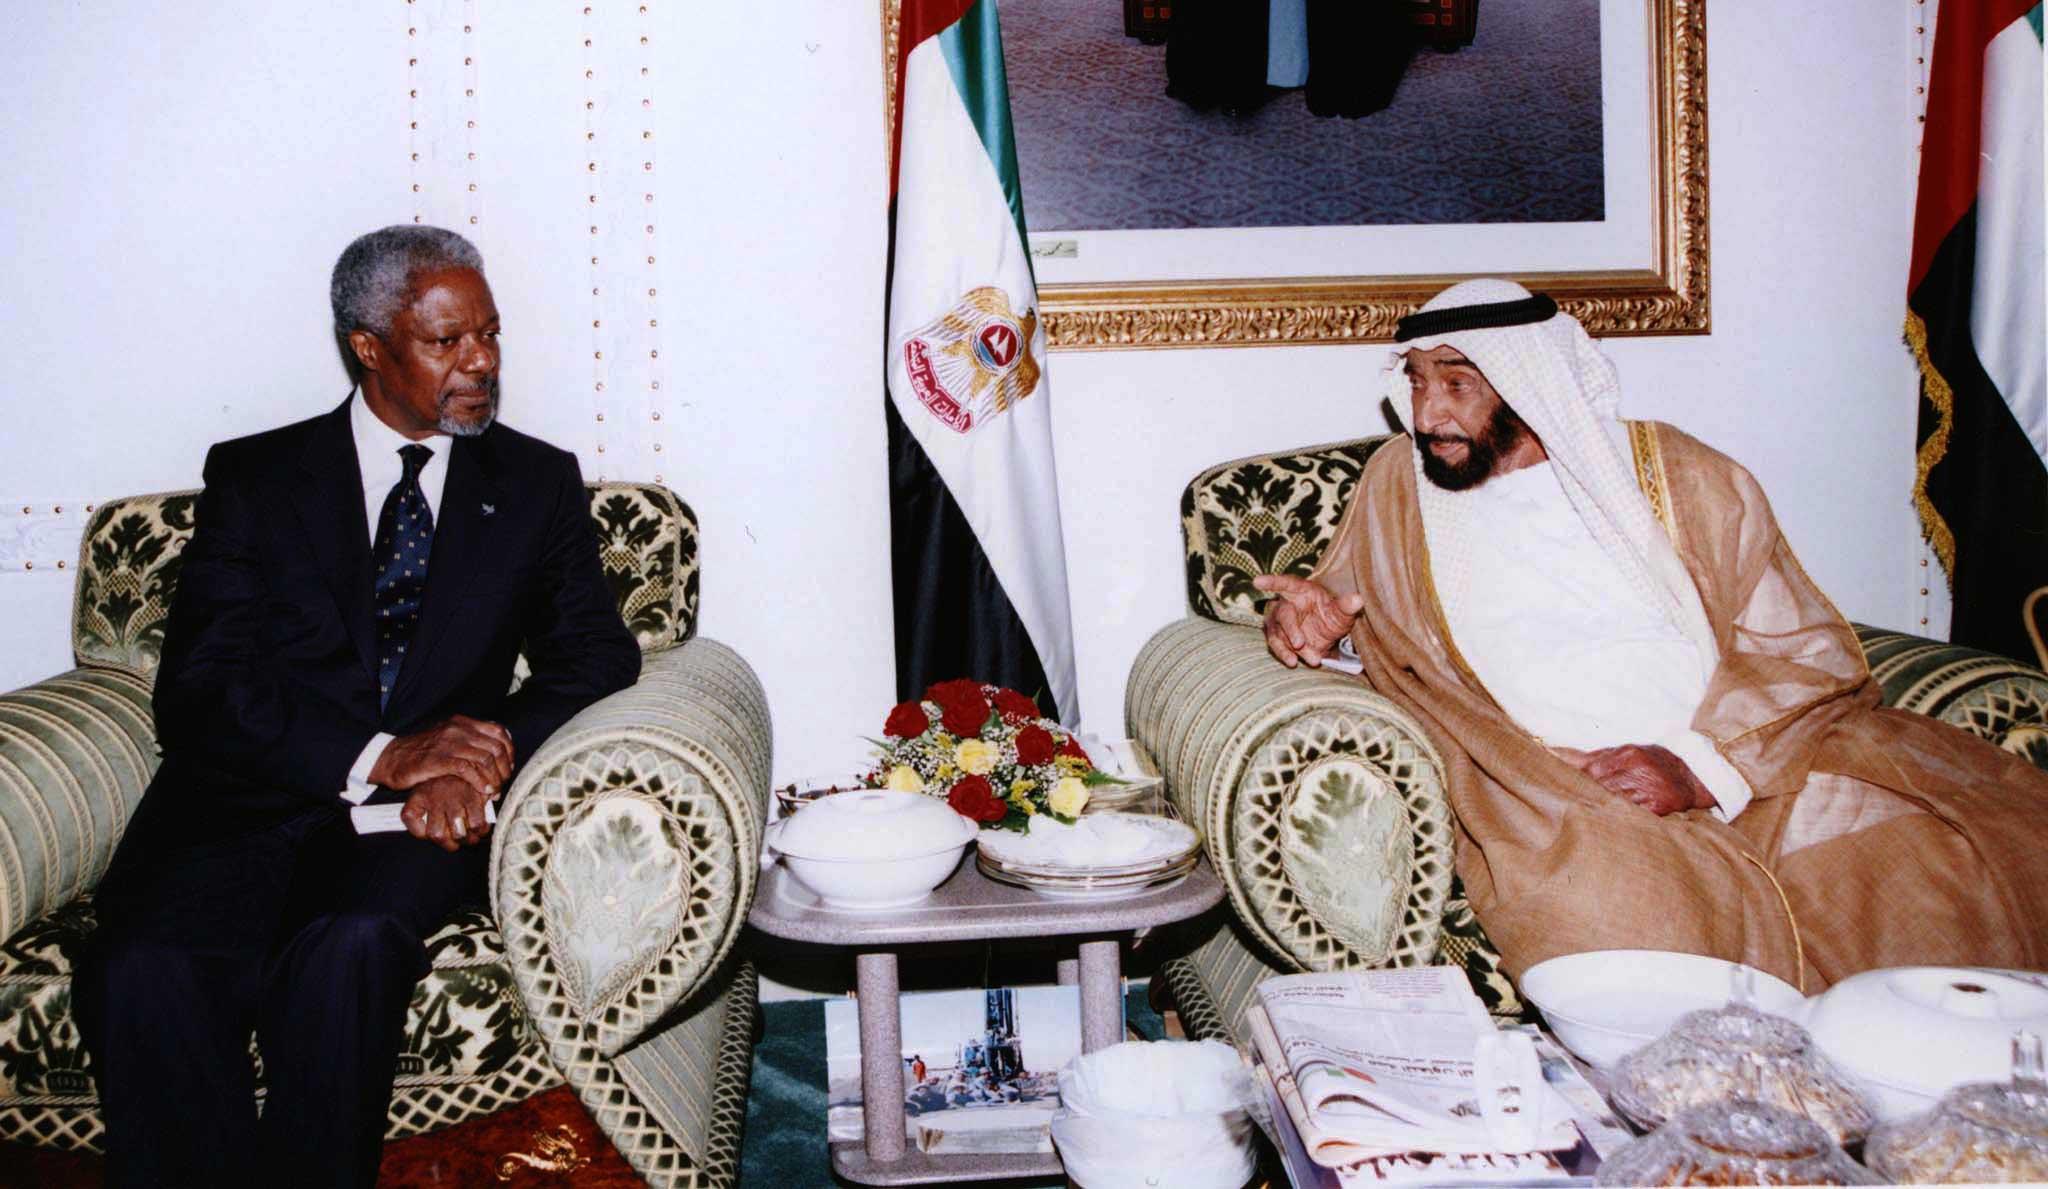 United Nations General Secretary Kofi Annan (L) meets United Arab Emirates President Sheikh Zaid bin Sultan al-Nahayan in Abu Dhabi ahead of the Gulf Cooperation Council annual summit December 7. (File photo: Reuters)